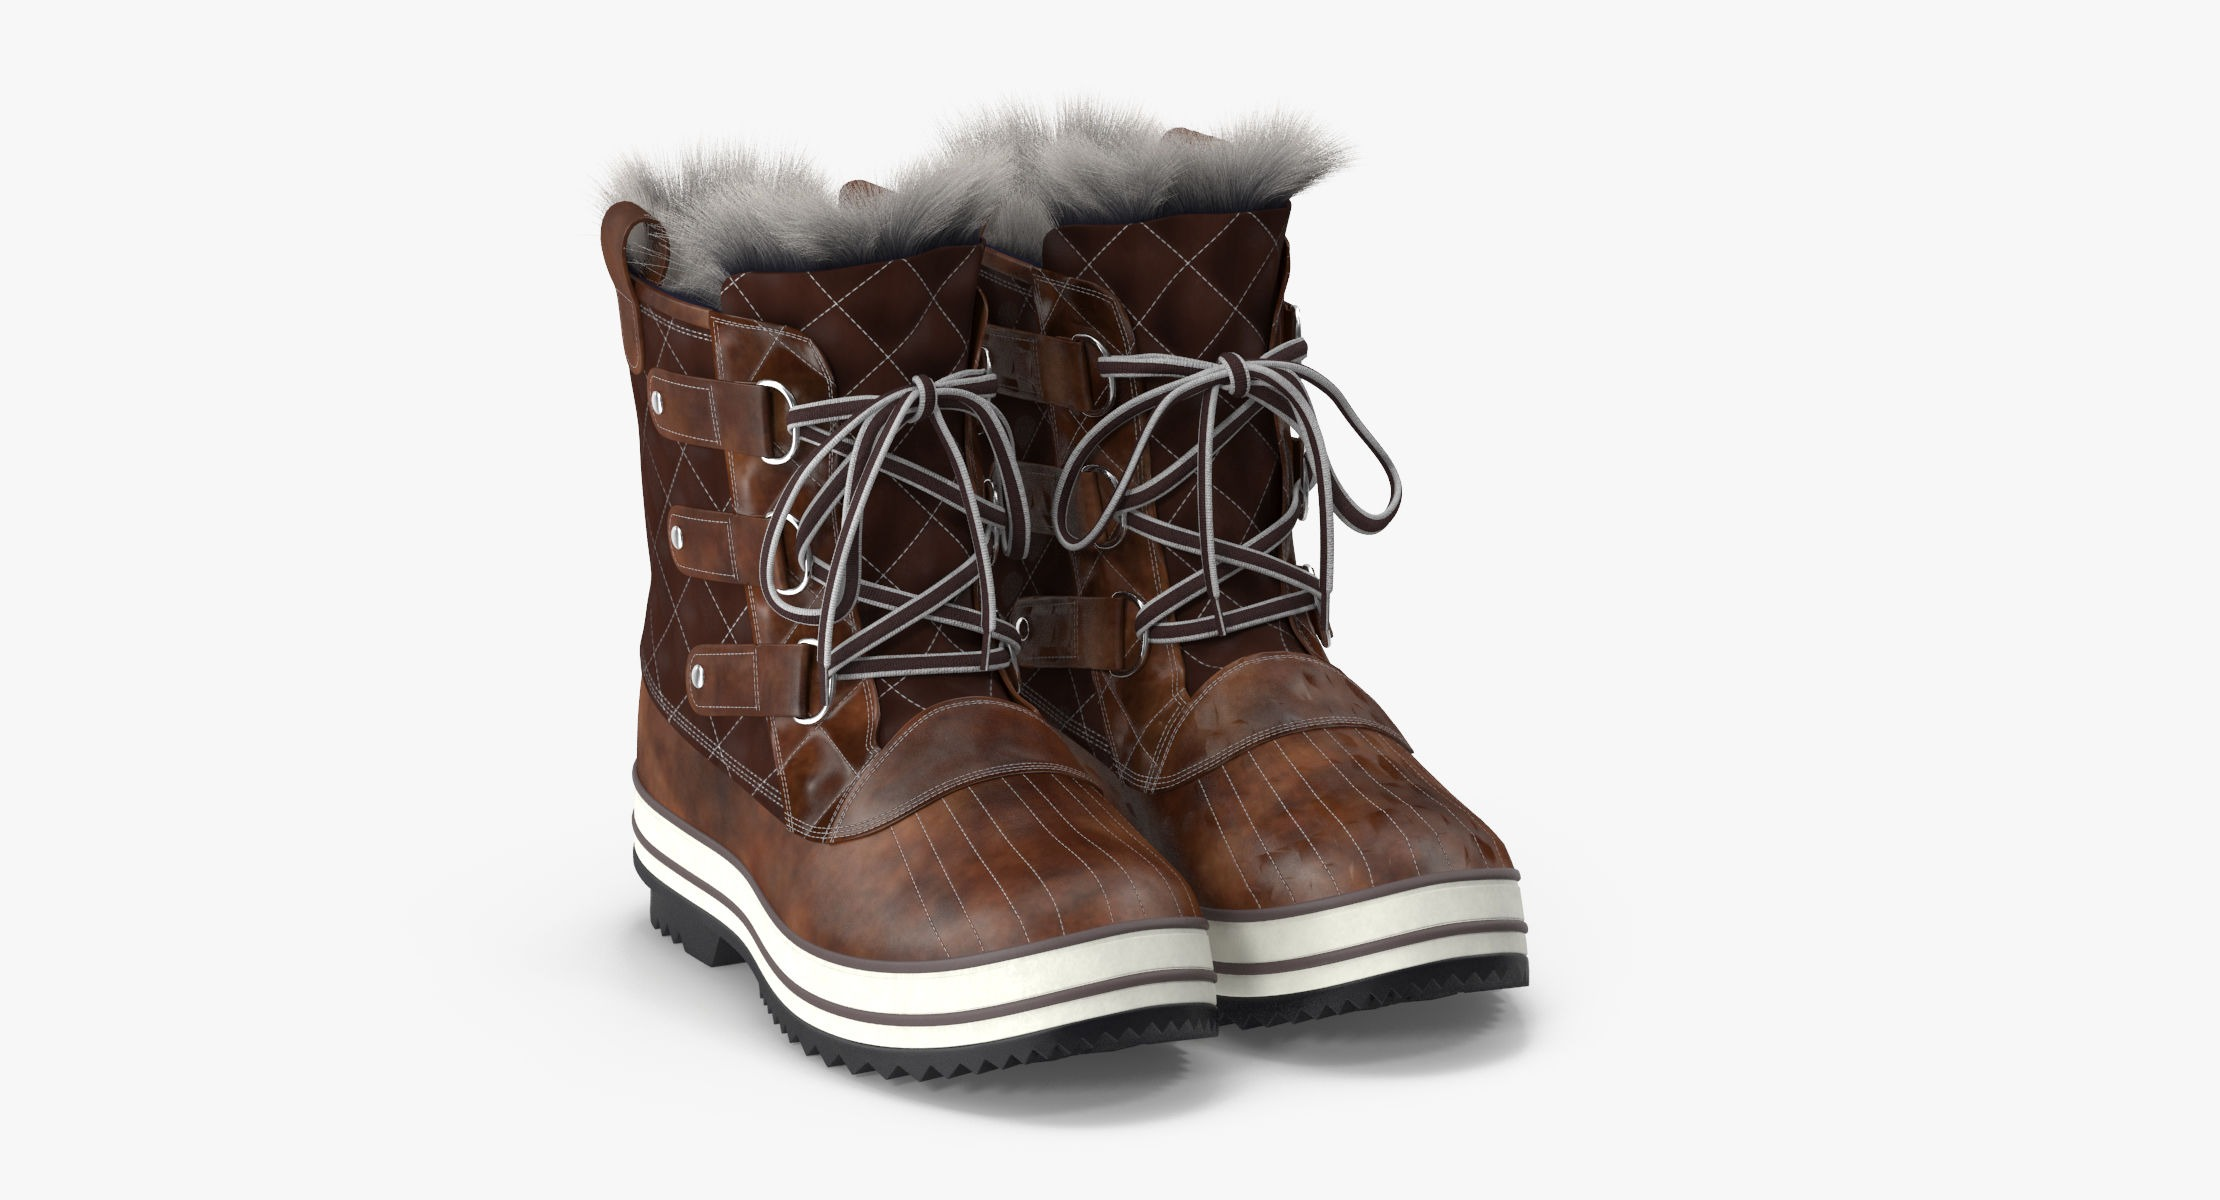 Snow Boots 02 - reel 1